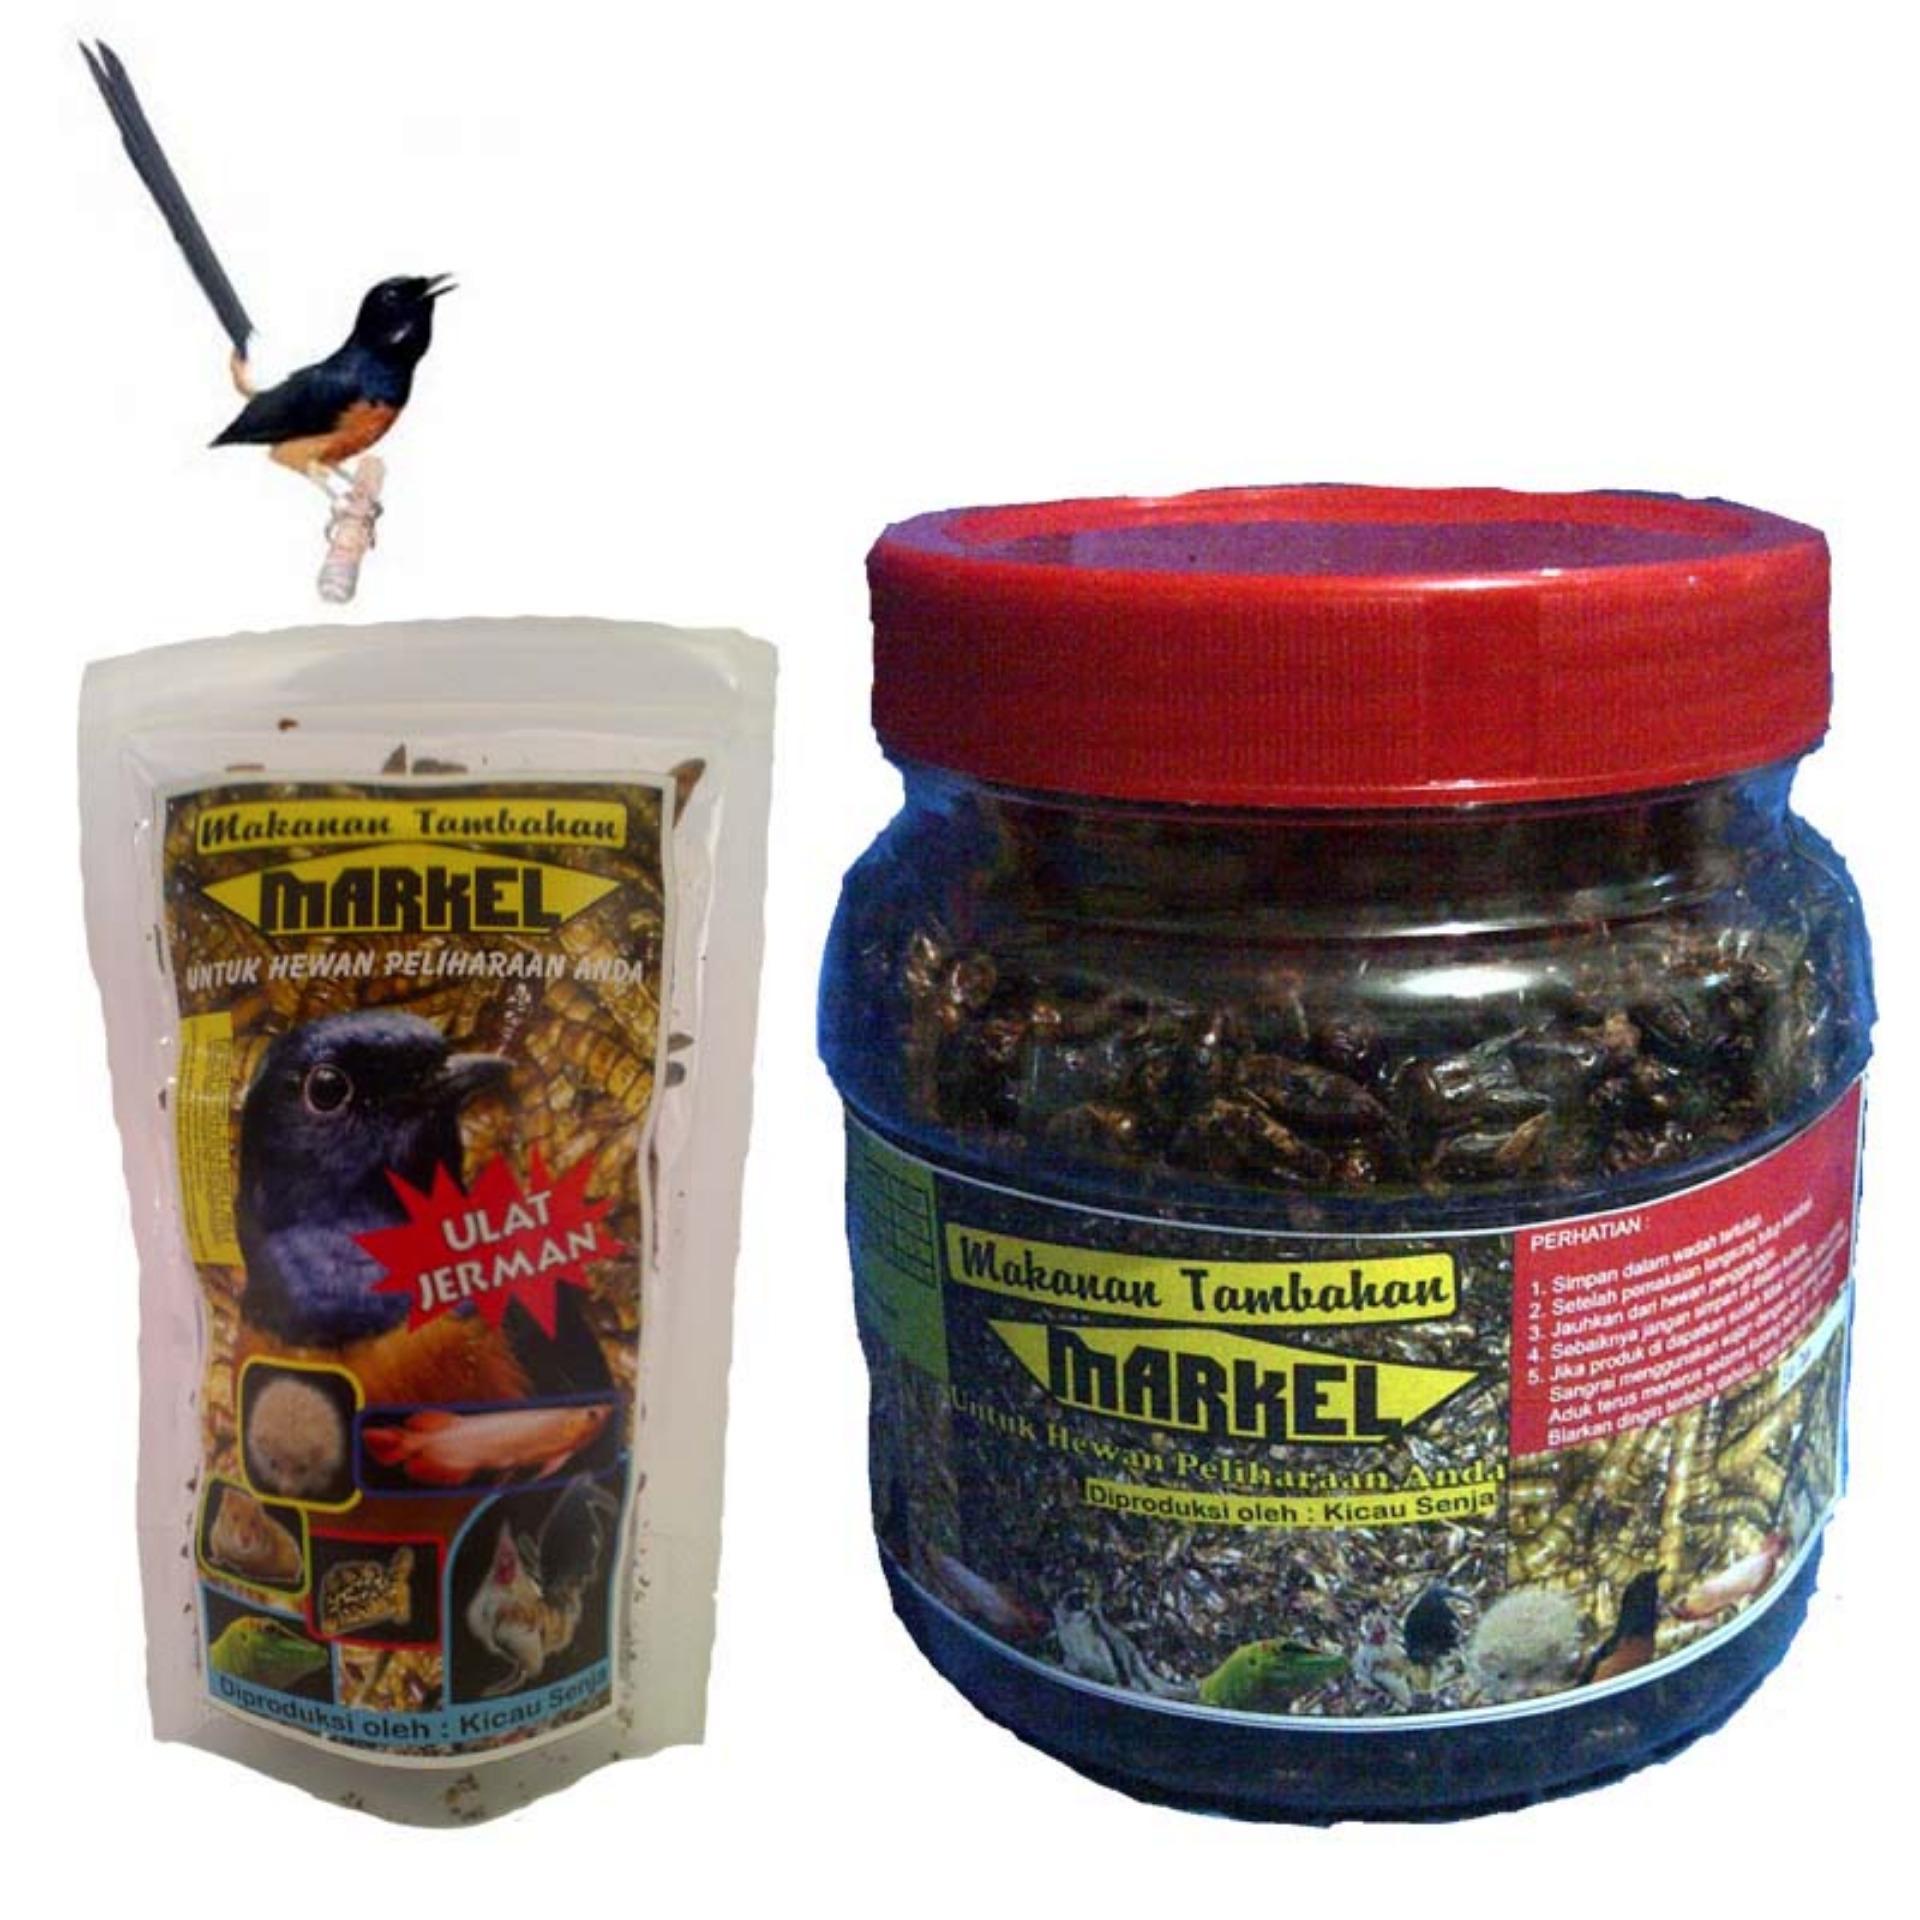 Markel Paket Serangga Kering Untuk Burung Murai Batu - Paket 2..